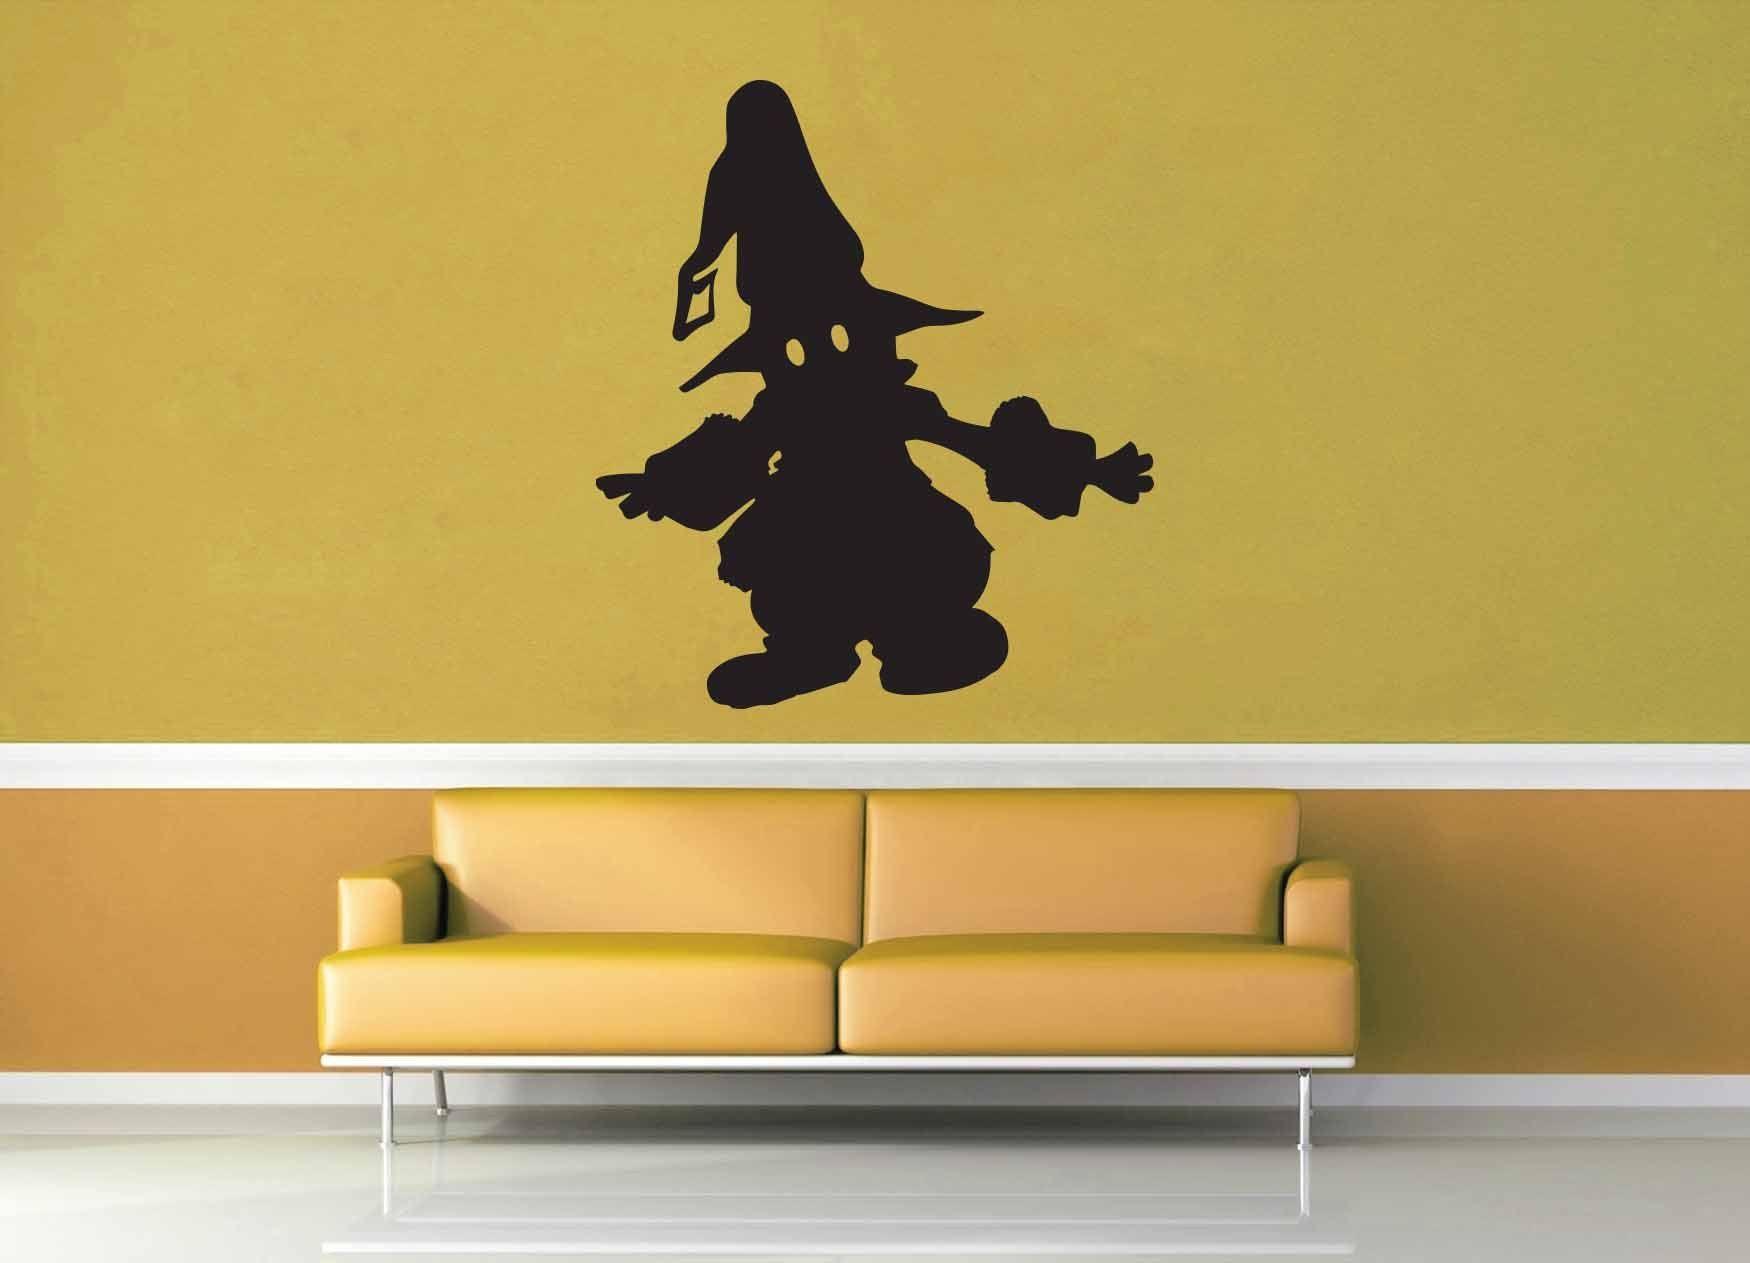 Vivi Silhouette - No 1 - Final Fantasy 9 - Wall Decal | Pinterest ...